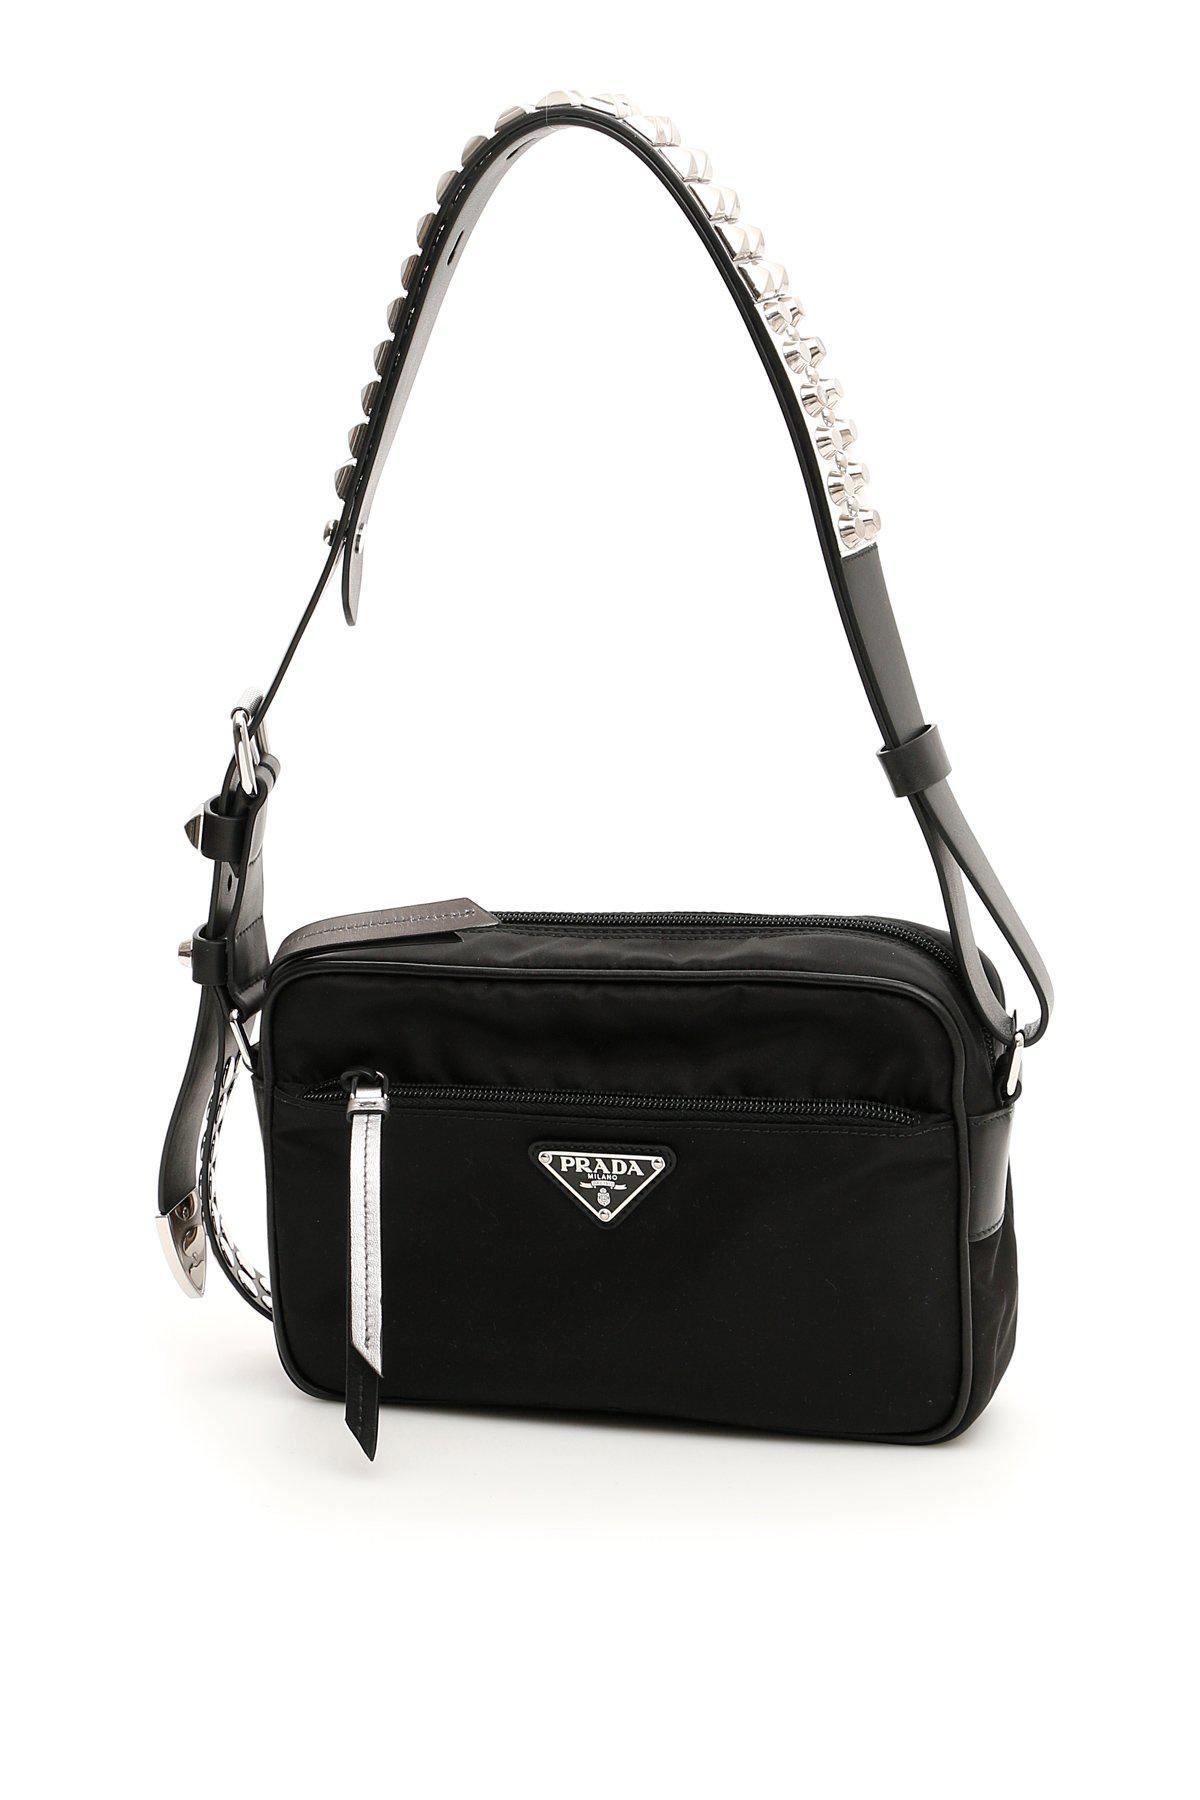 a54eea358234 Prada Studded Strap Shoulder Bag in Black - Lyst